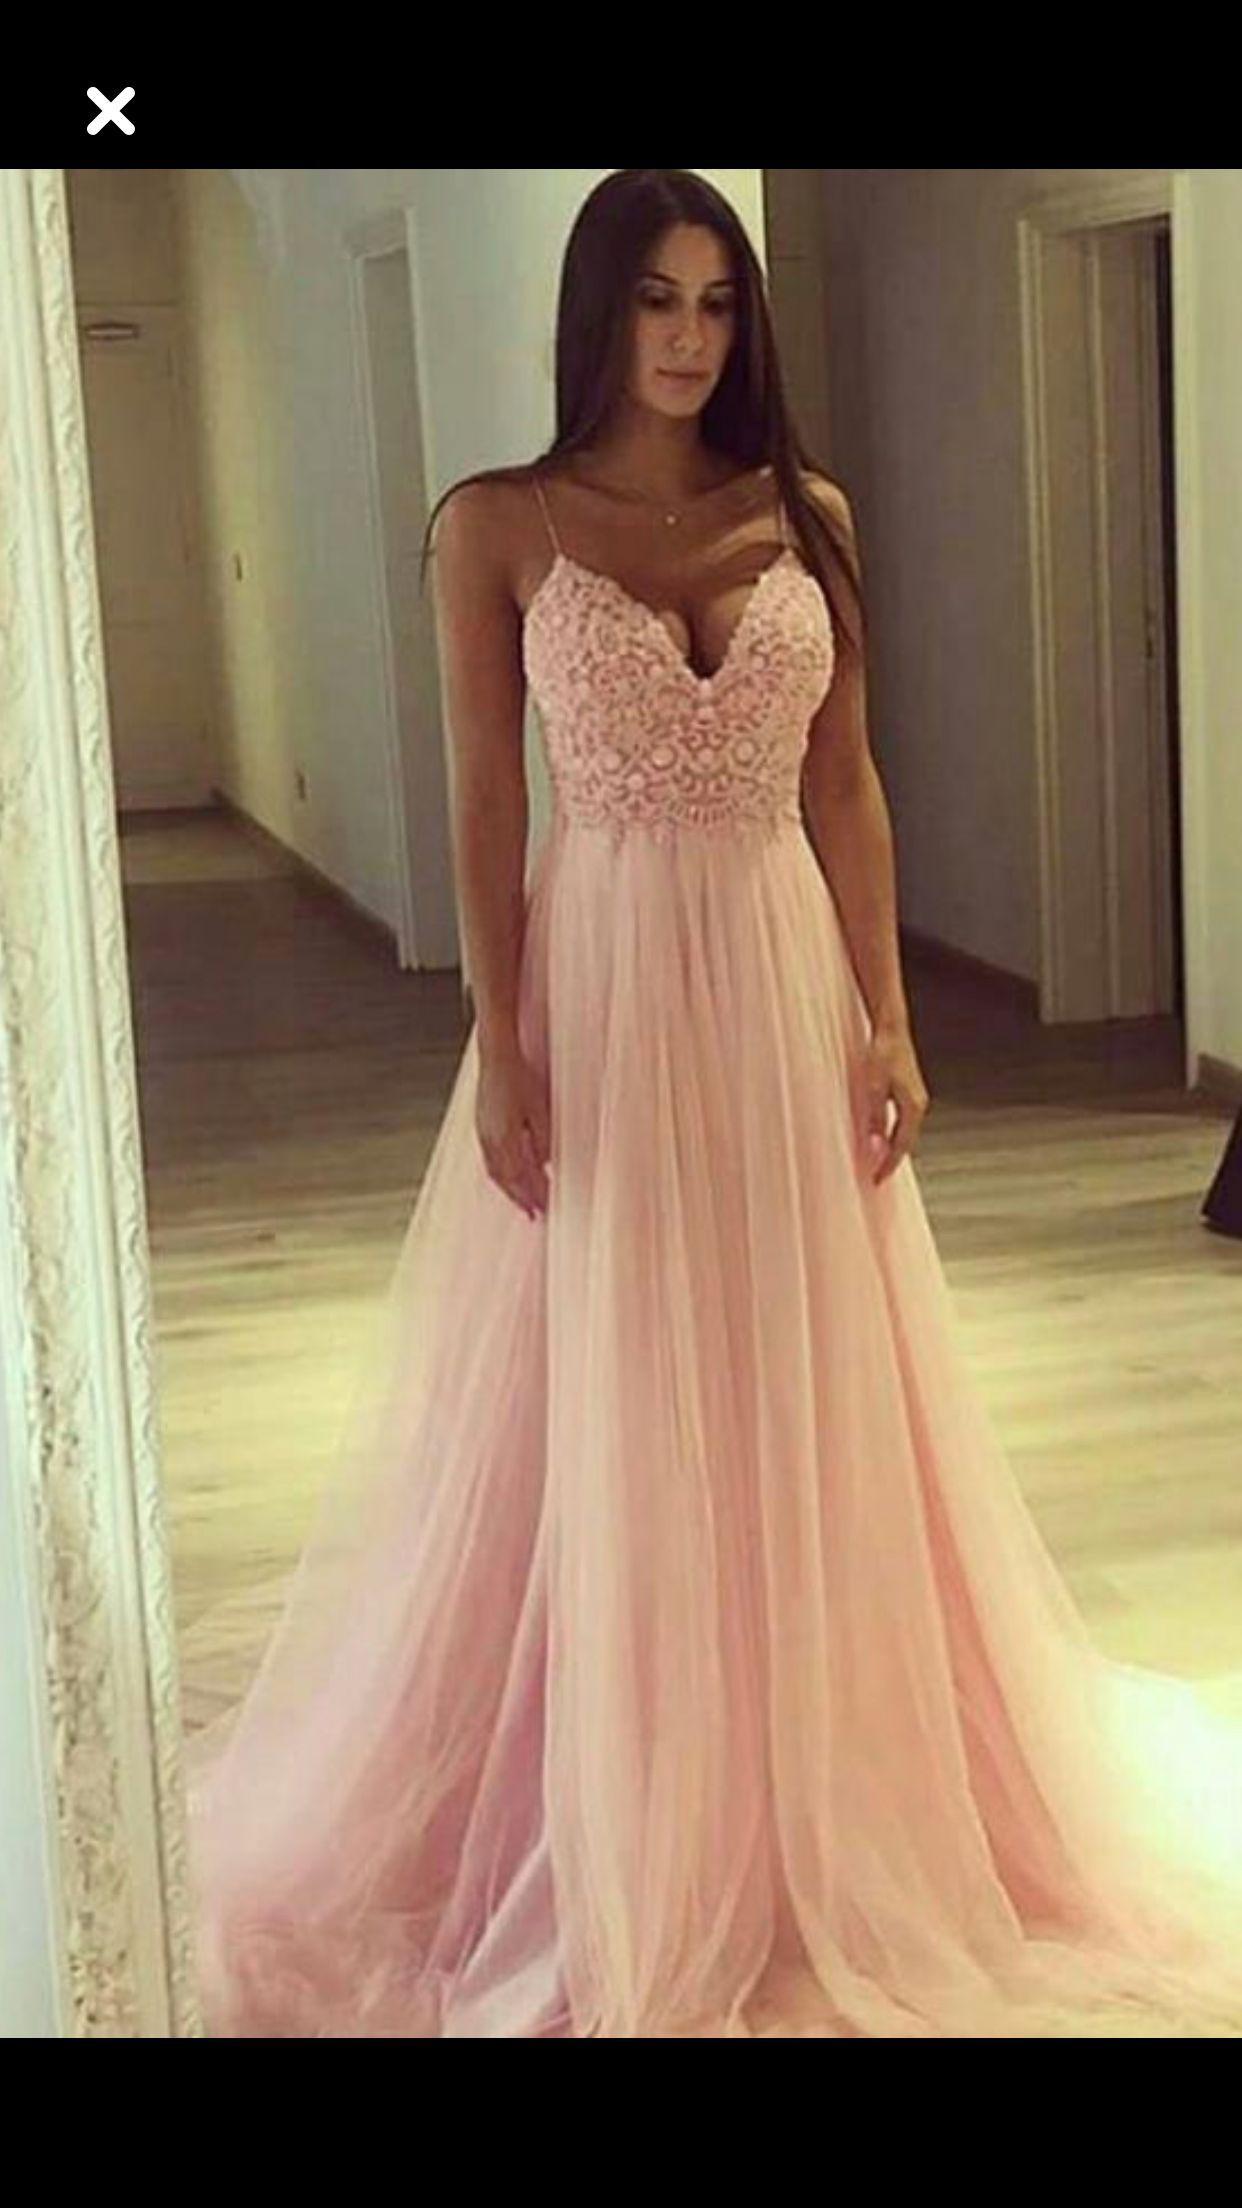 Spaghetti Strap Prom Dresses